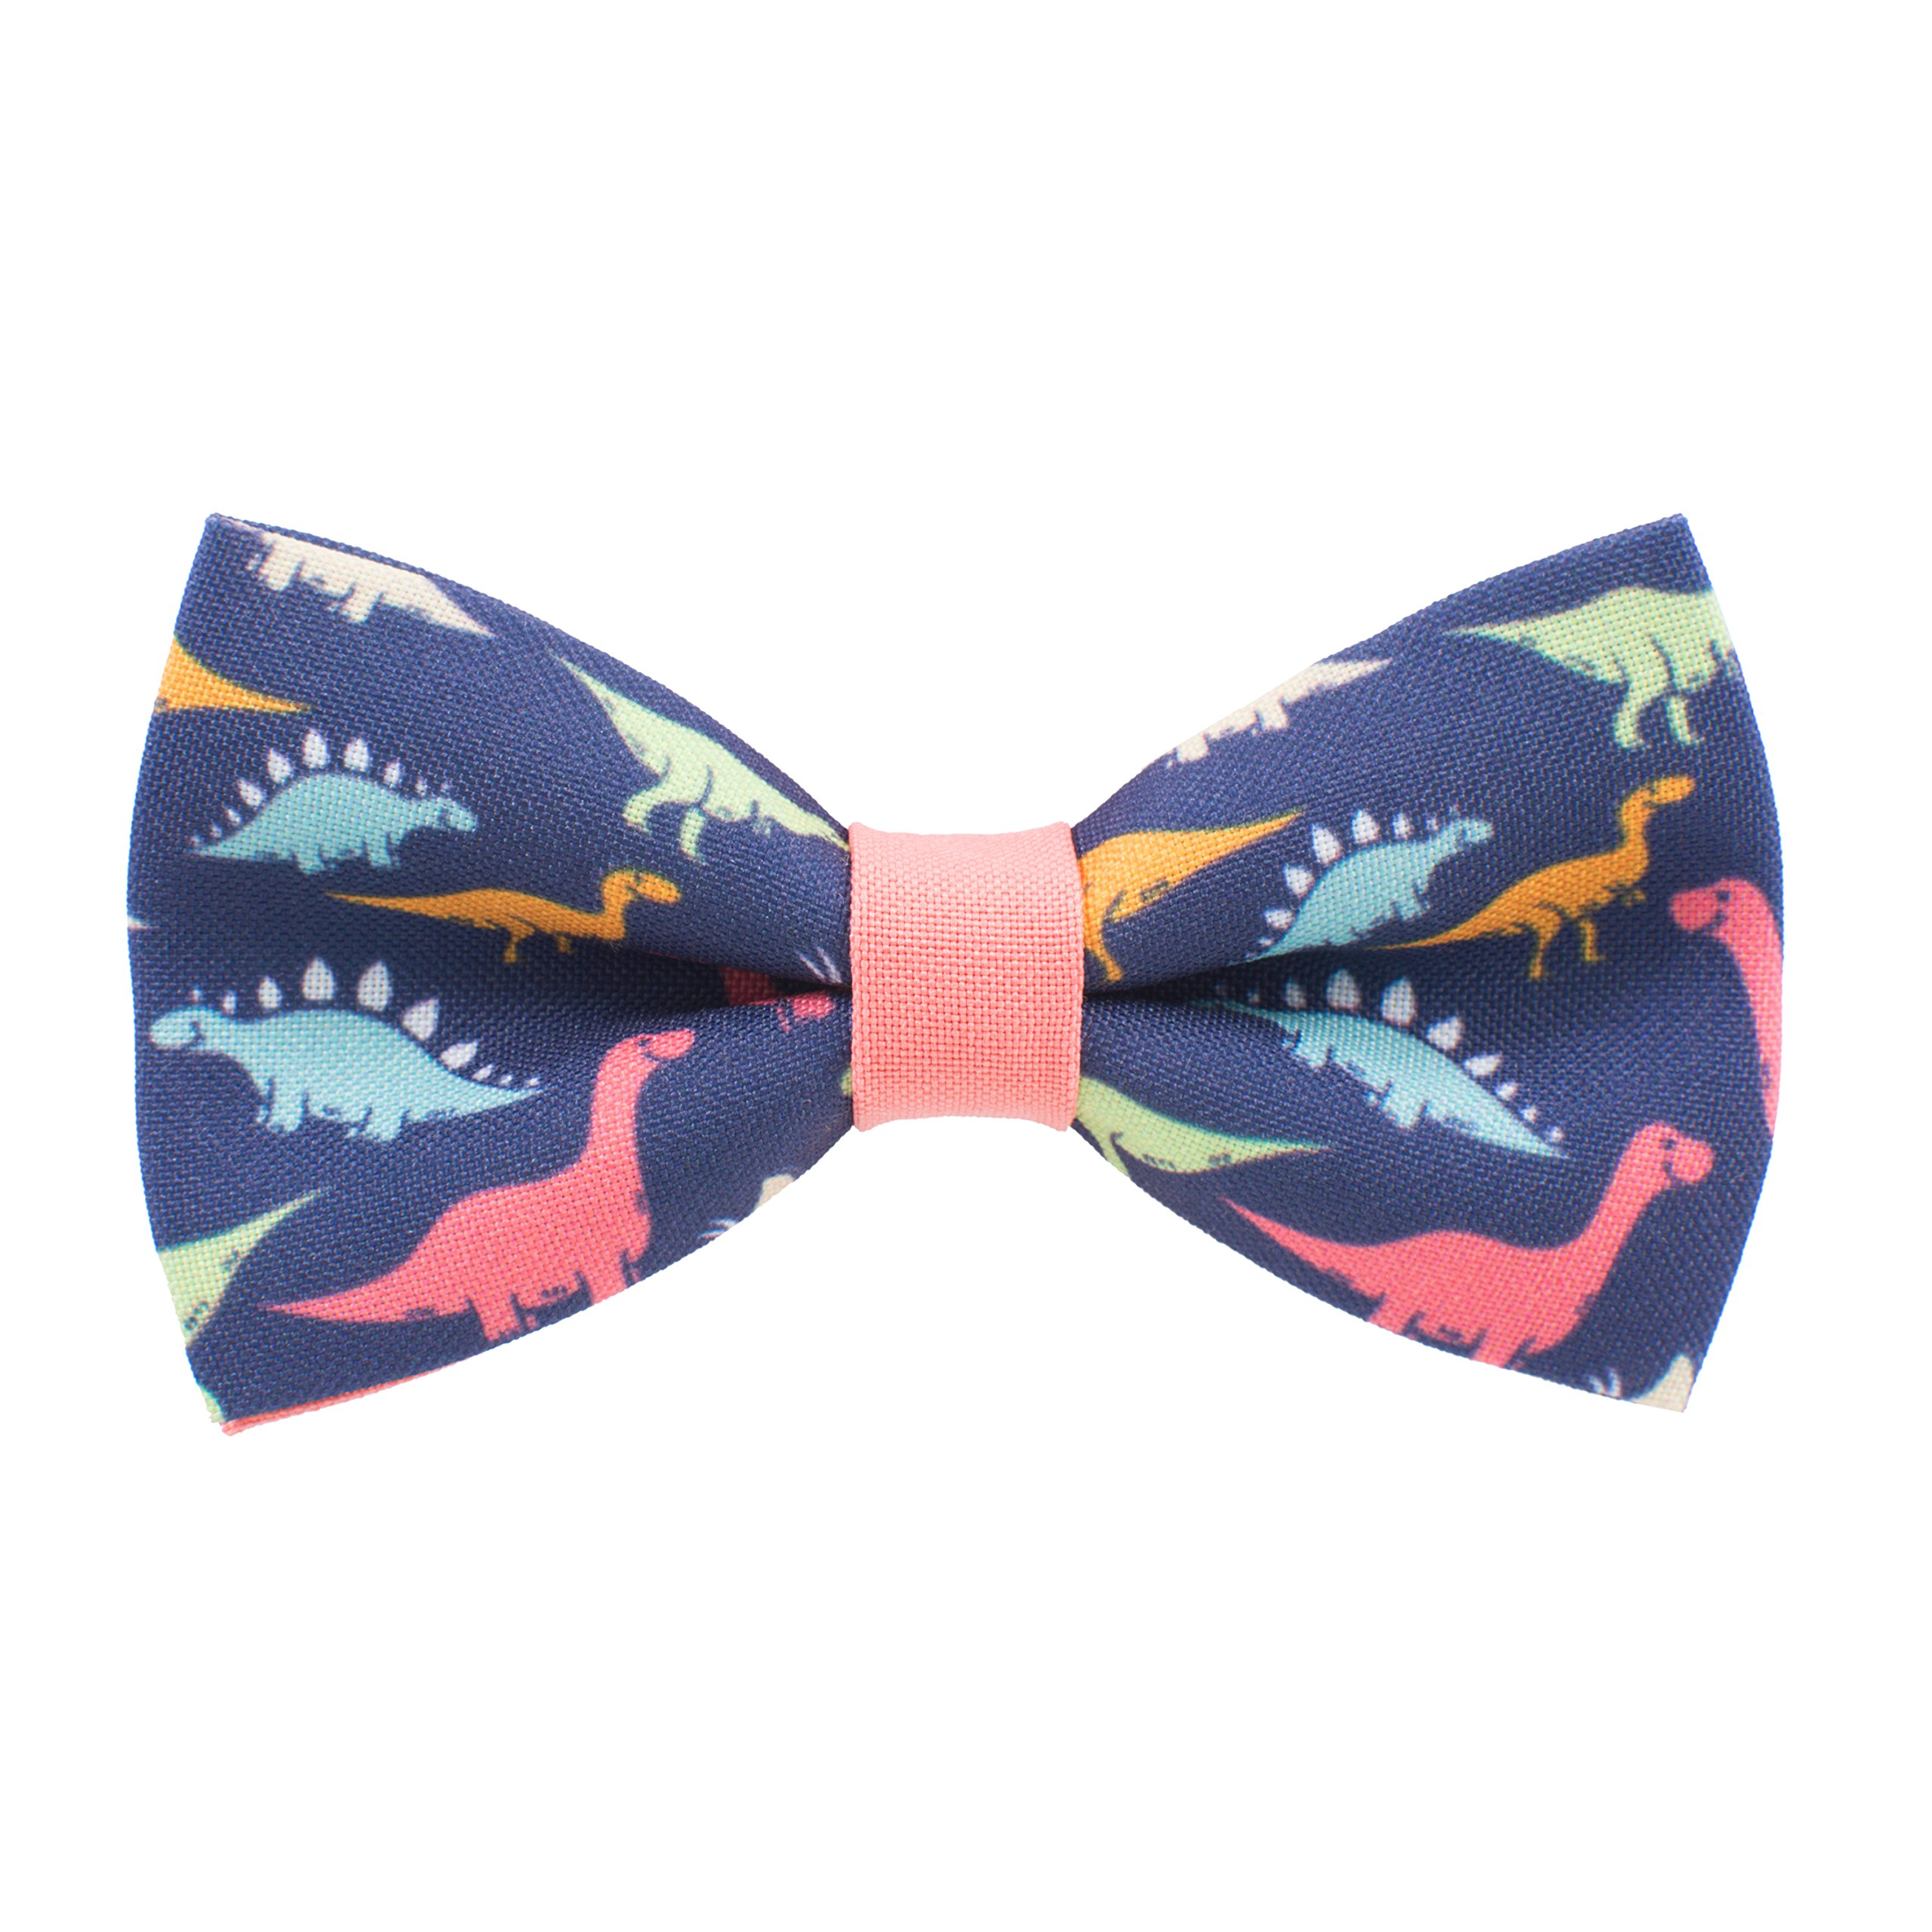 Bow Tie House Dinosaurs bow tie pre-tied pattern blue-peach colors unisex shape